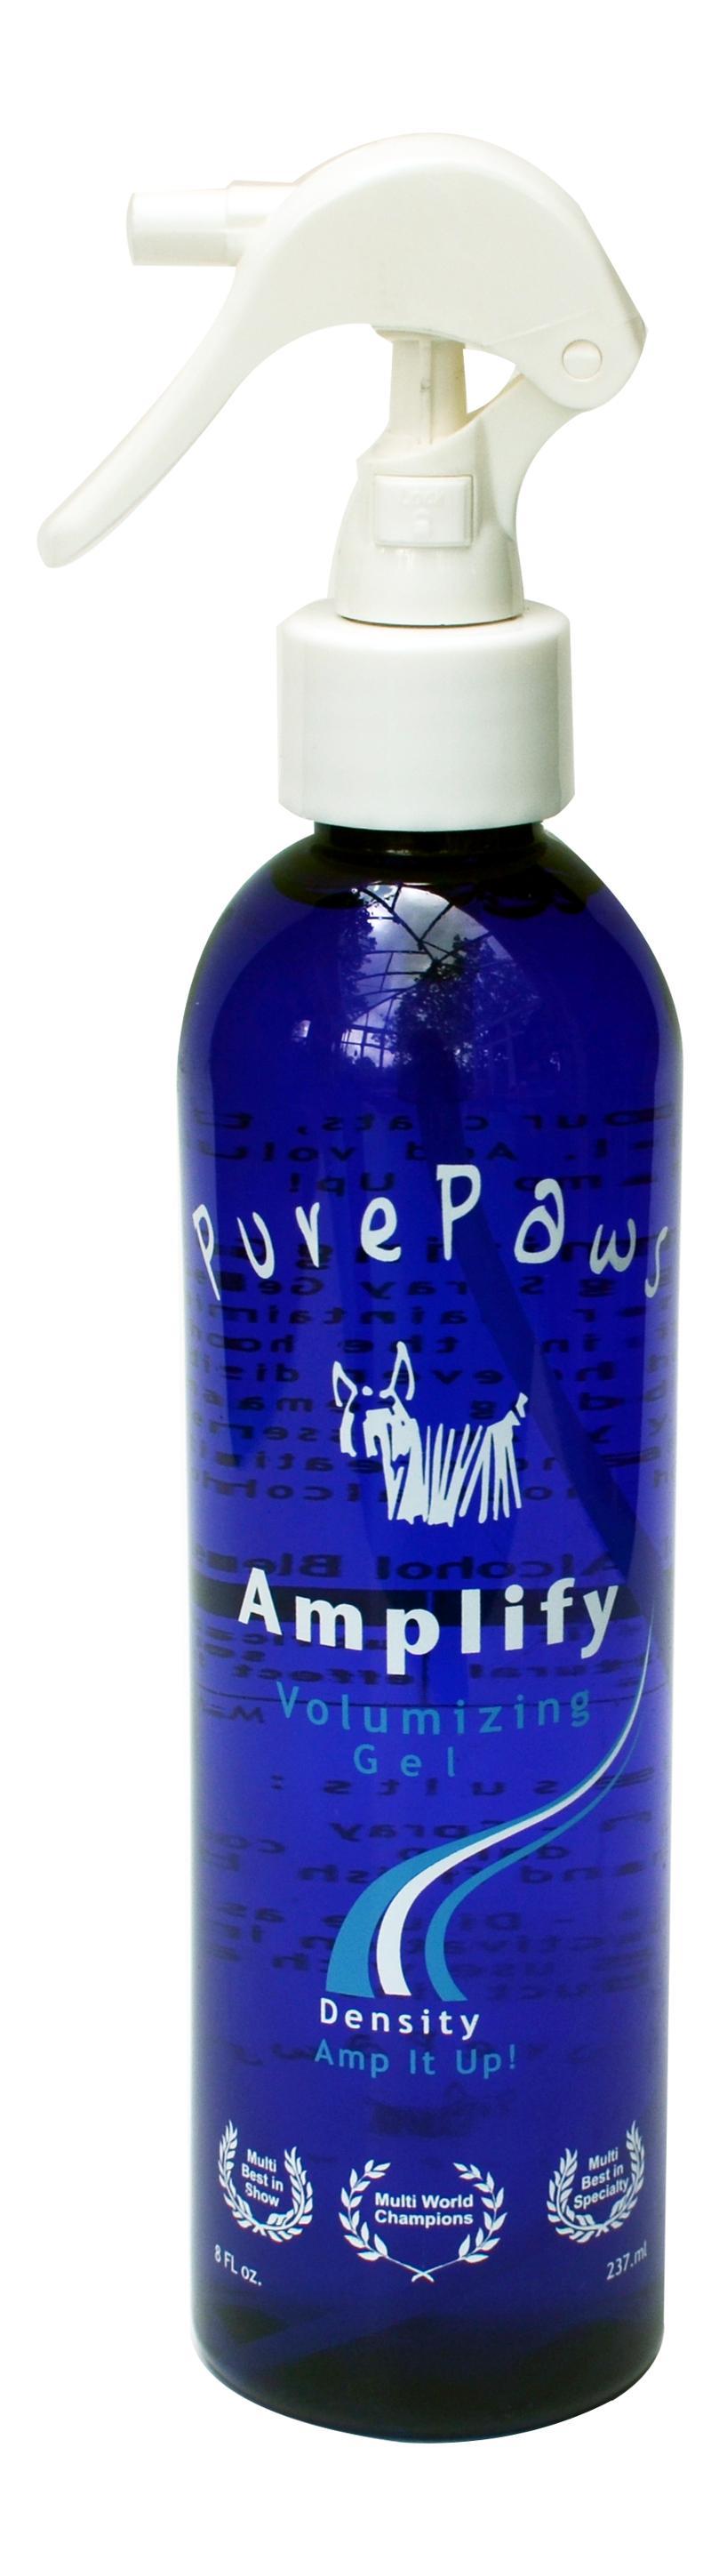 Amplify Volumizing Spray Gel